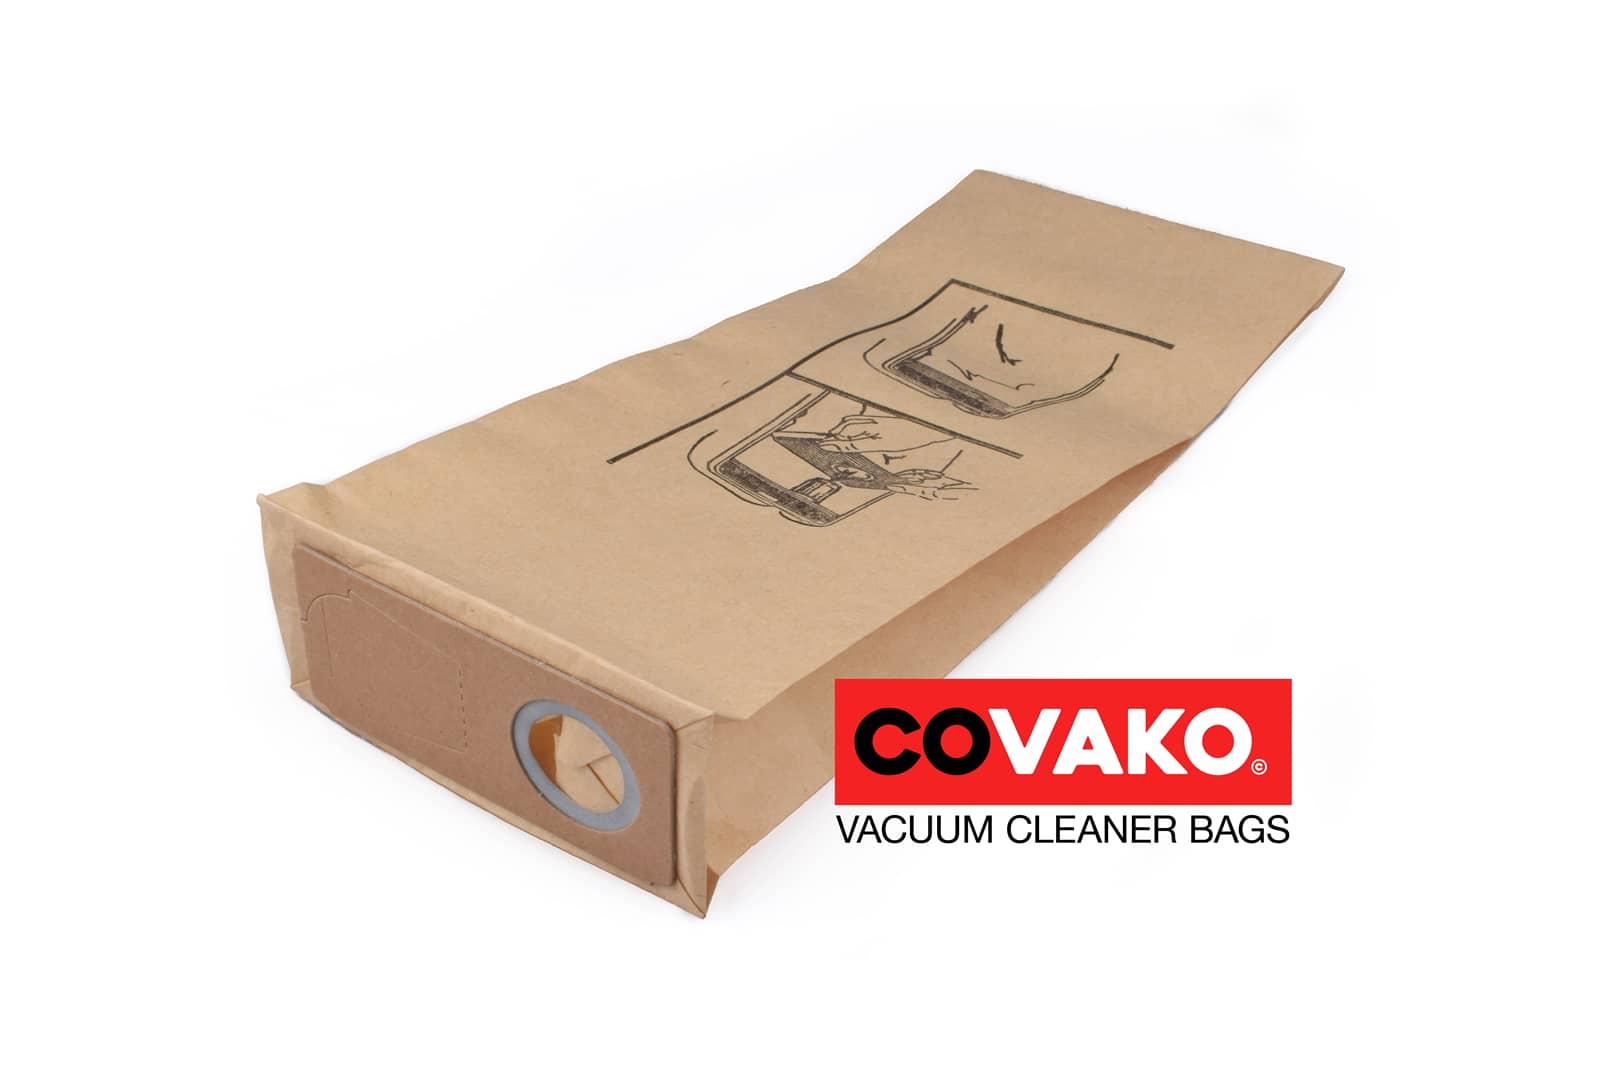 Wap GU 350 A / Paper - Wap vacuum cleaner bags